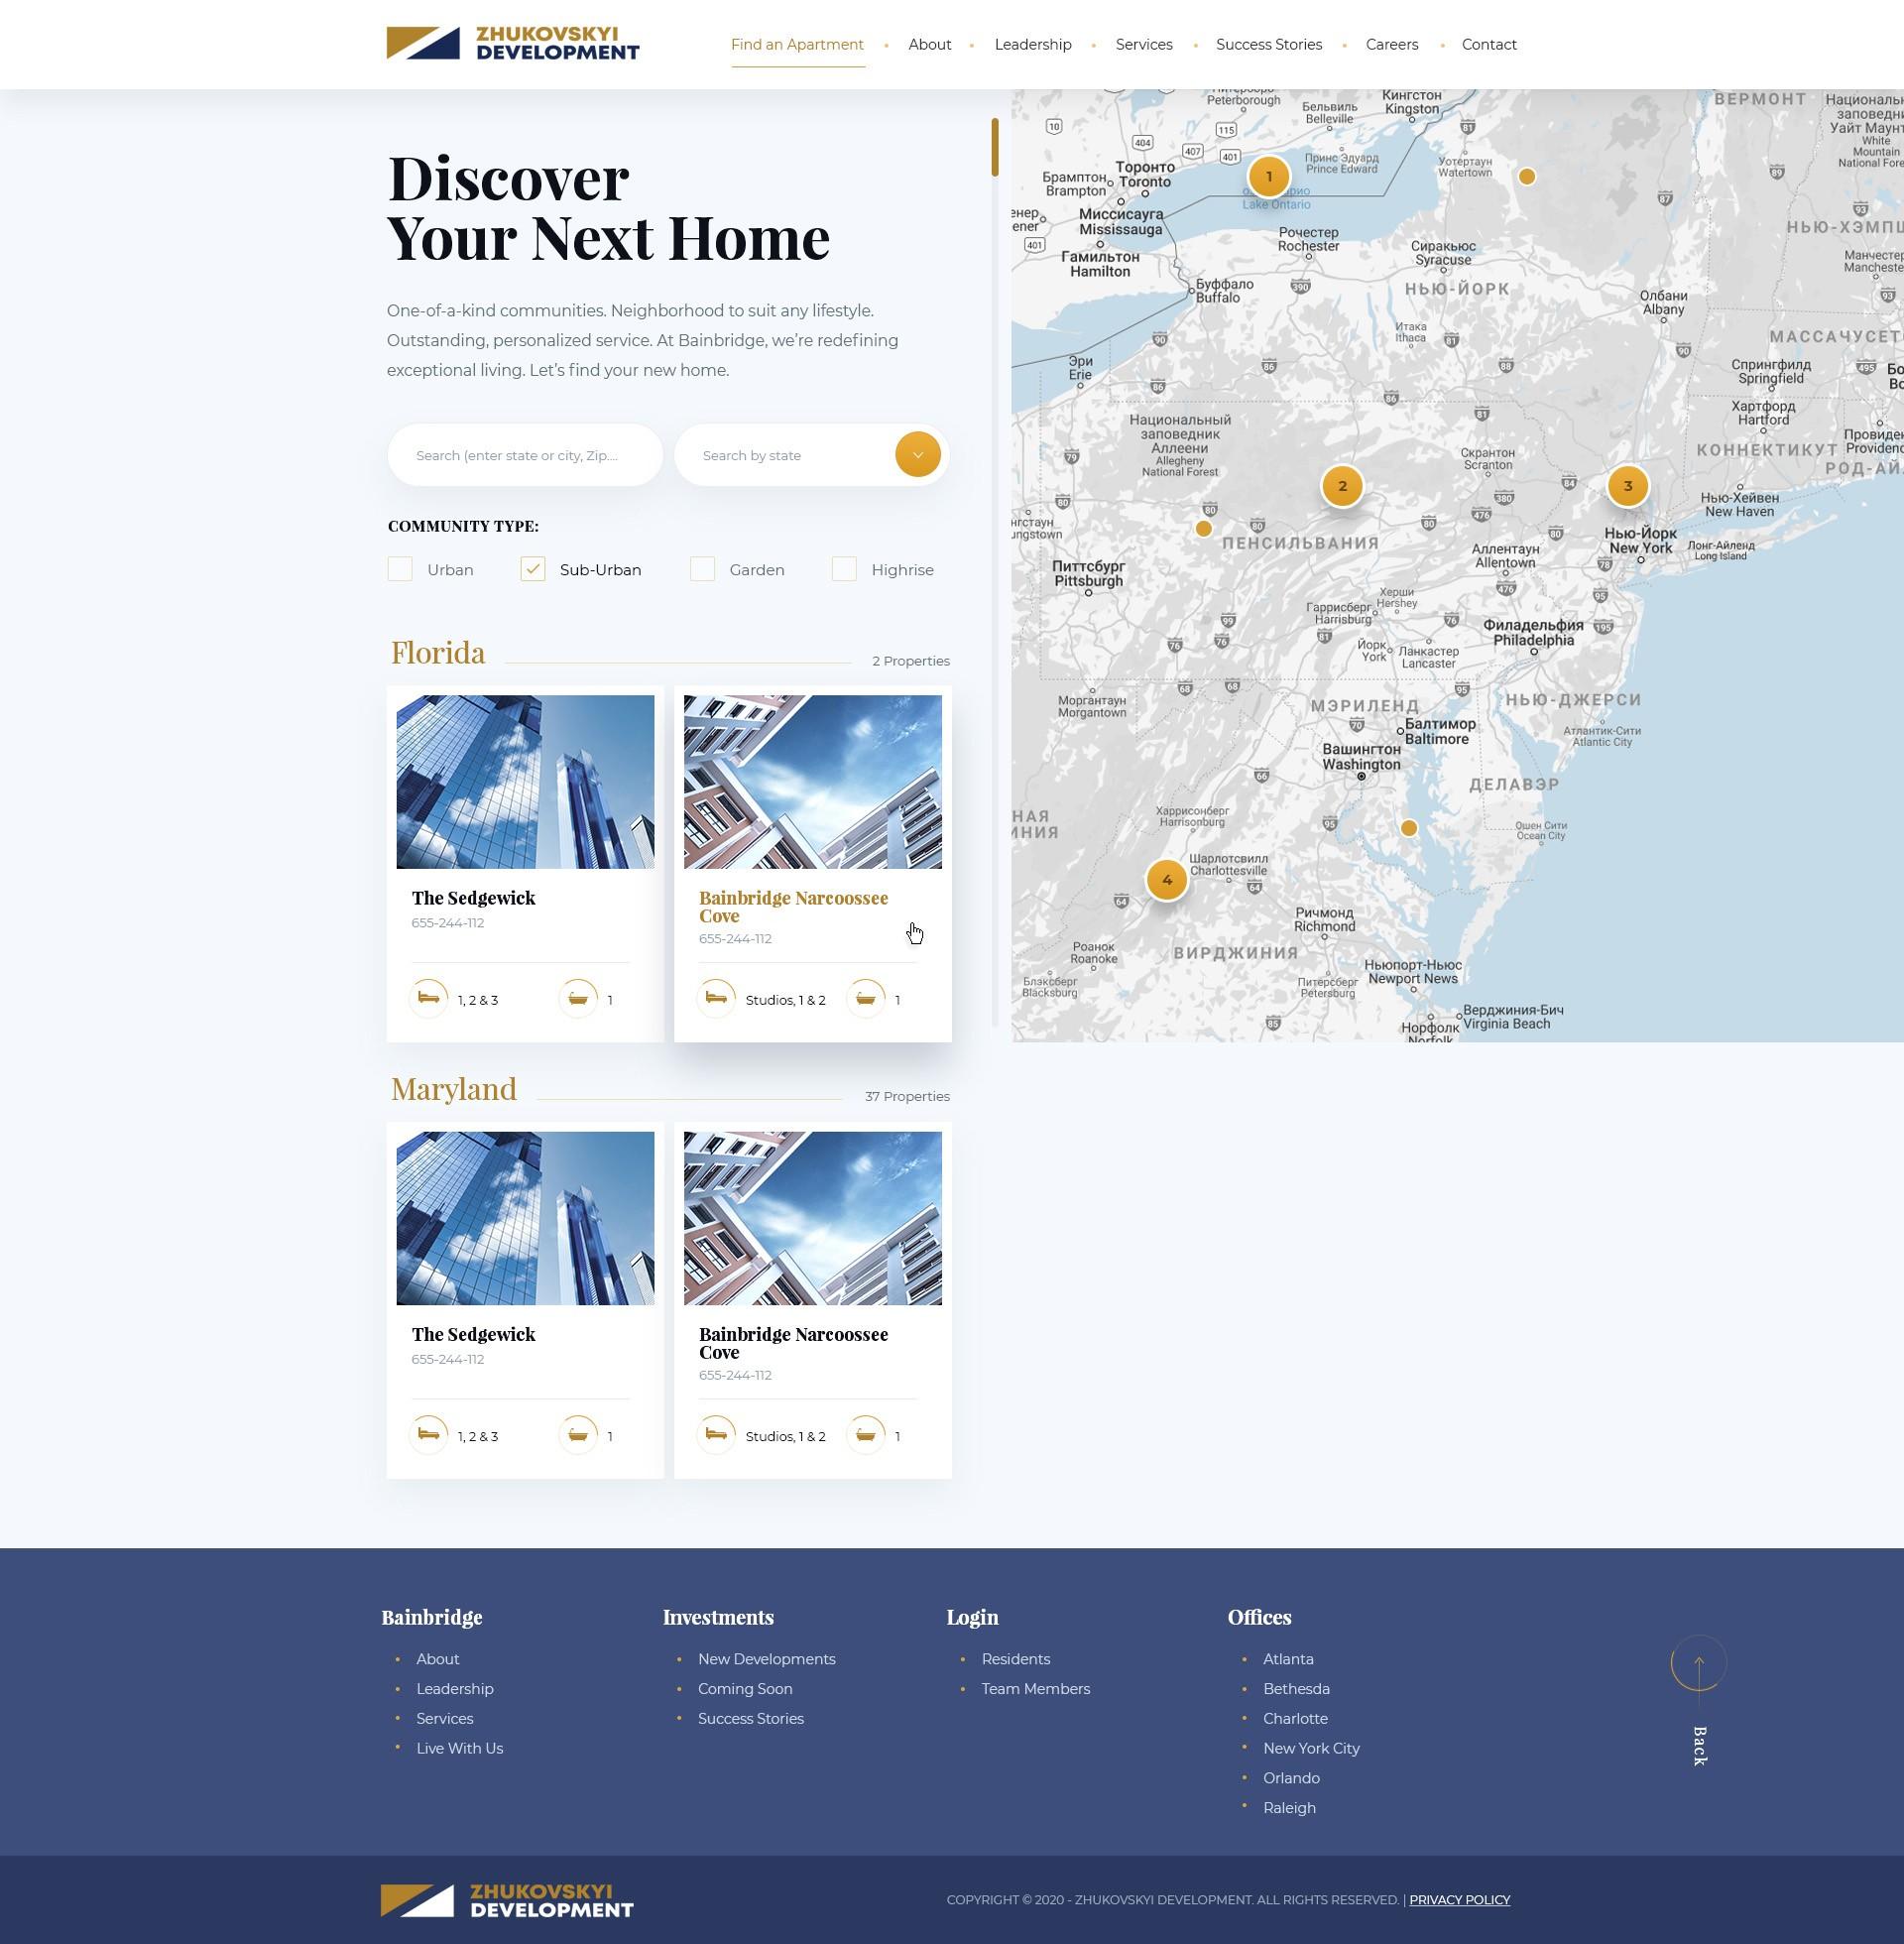 02_Zhukovskyi Development_Find-Apartment_0.1